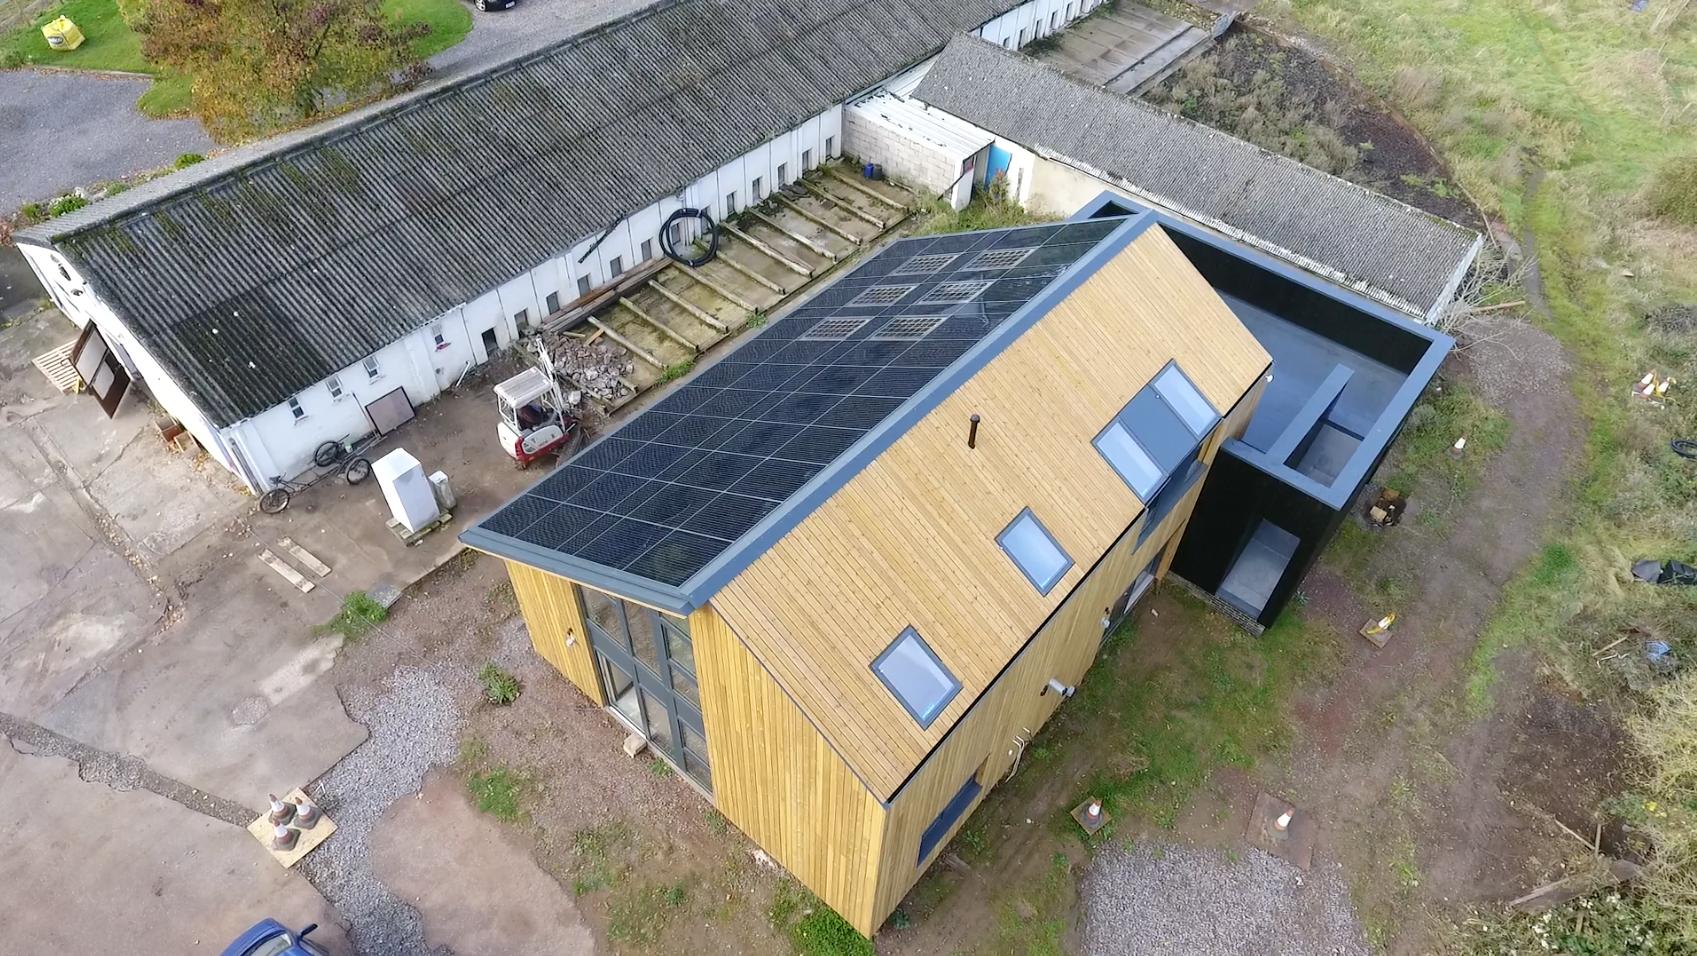 Solarsense aerial view